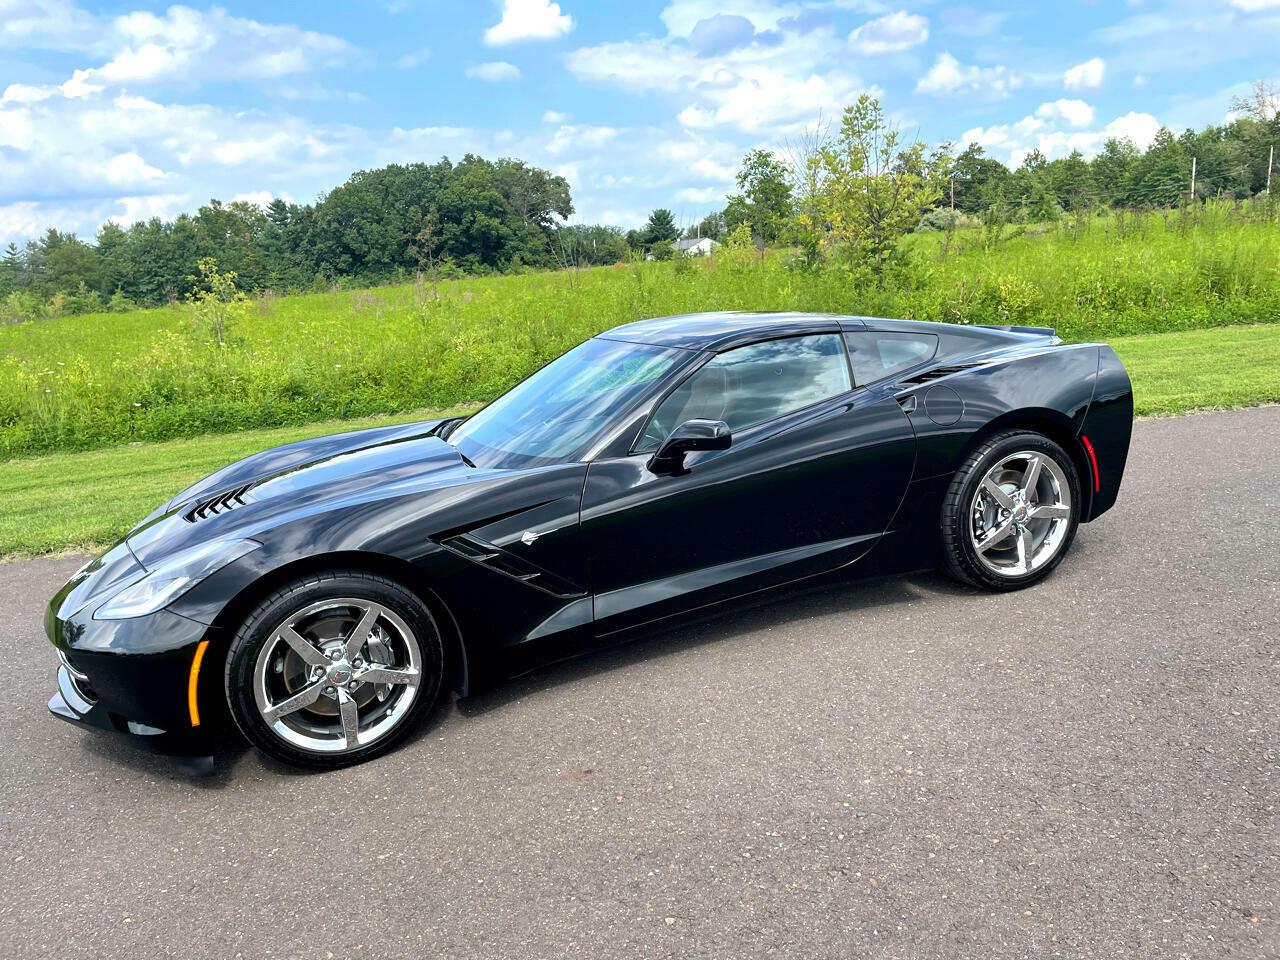 2014 Black Chevrolet Corvette Coupe 3LT | C7 Corvette Photo 6